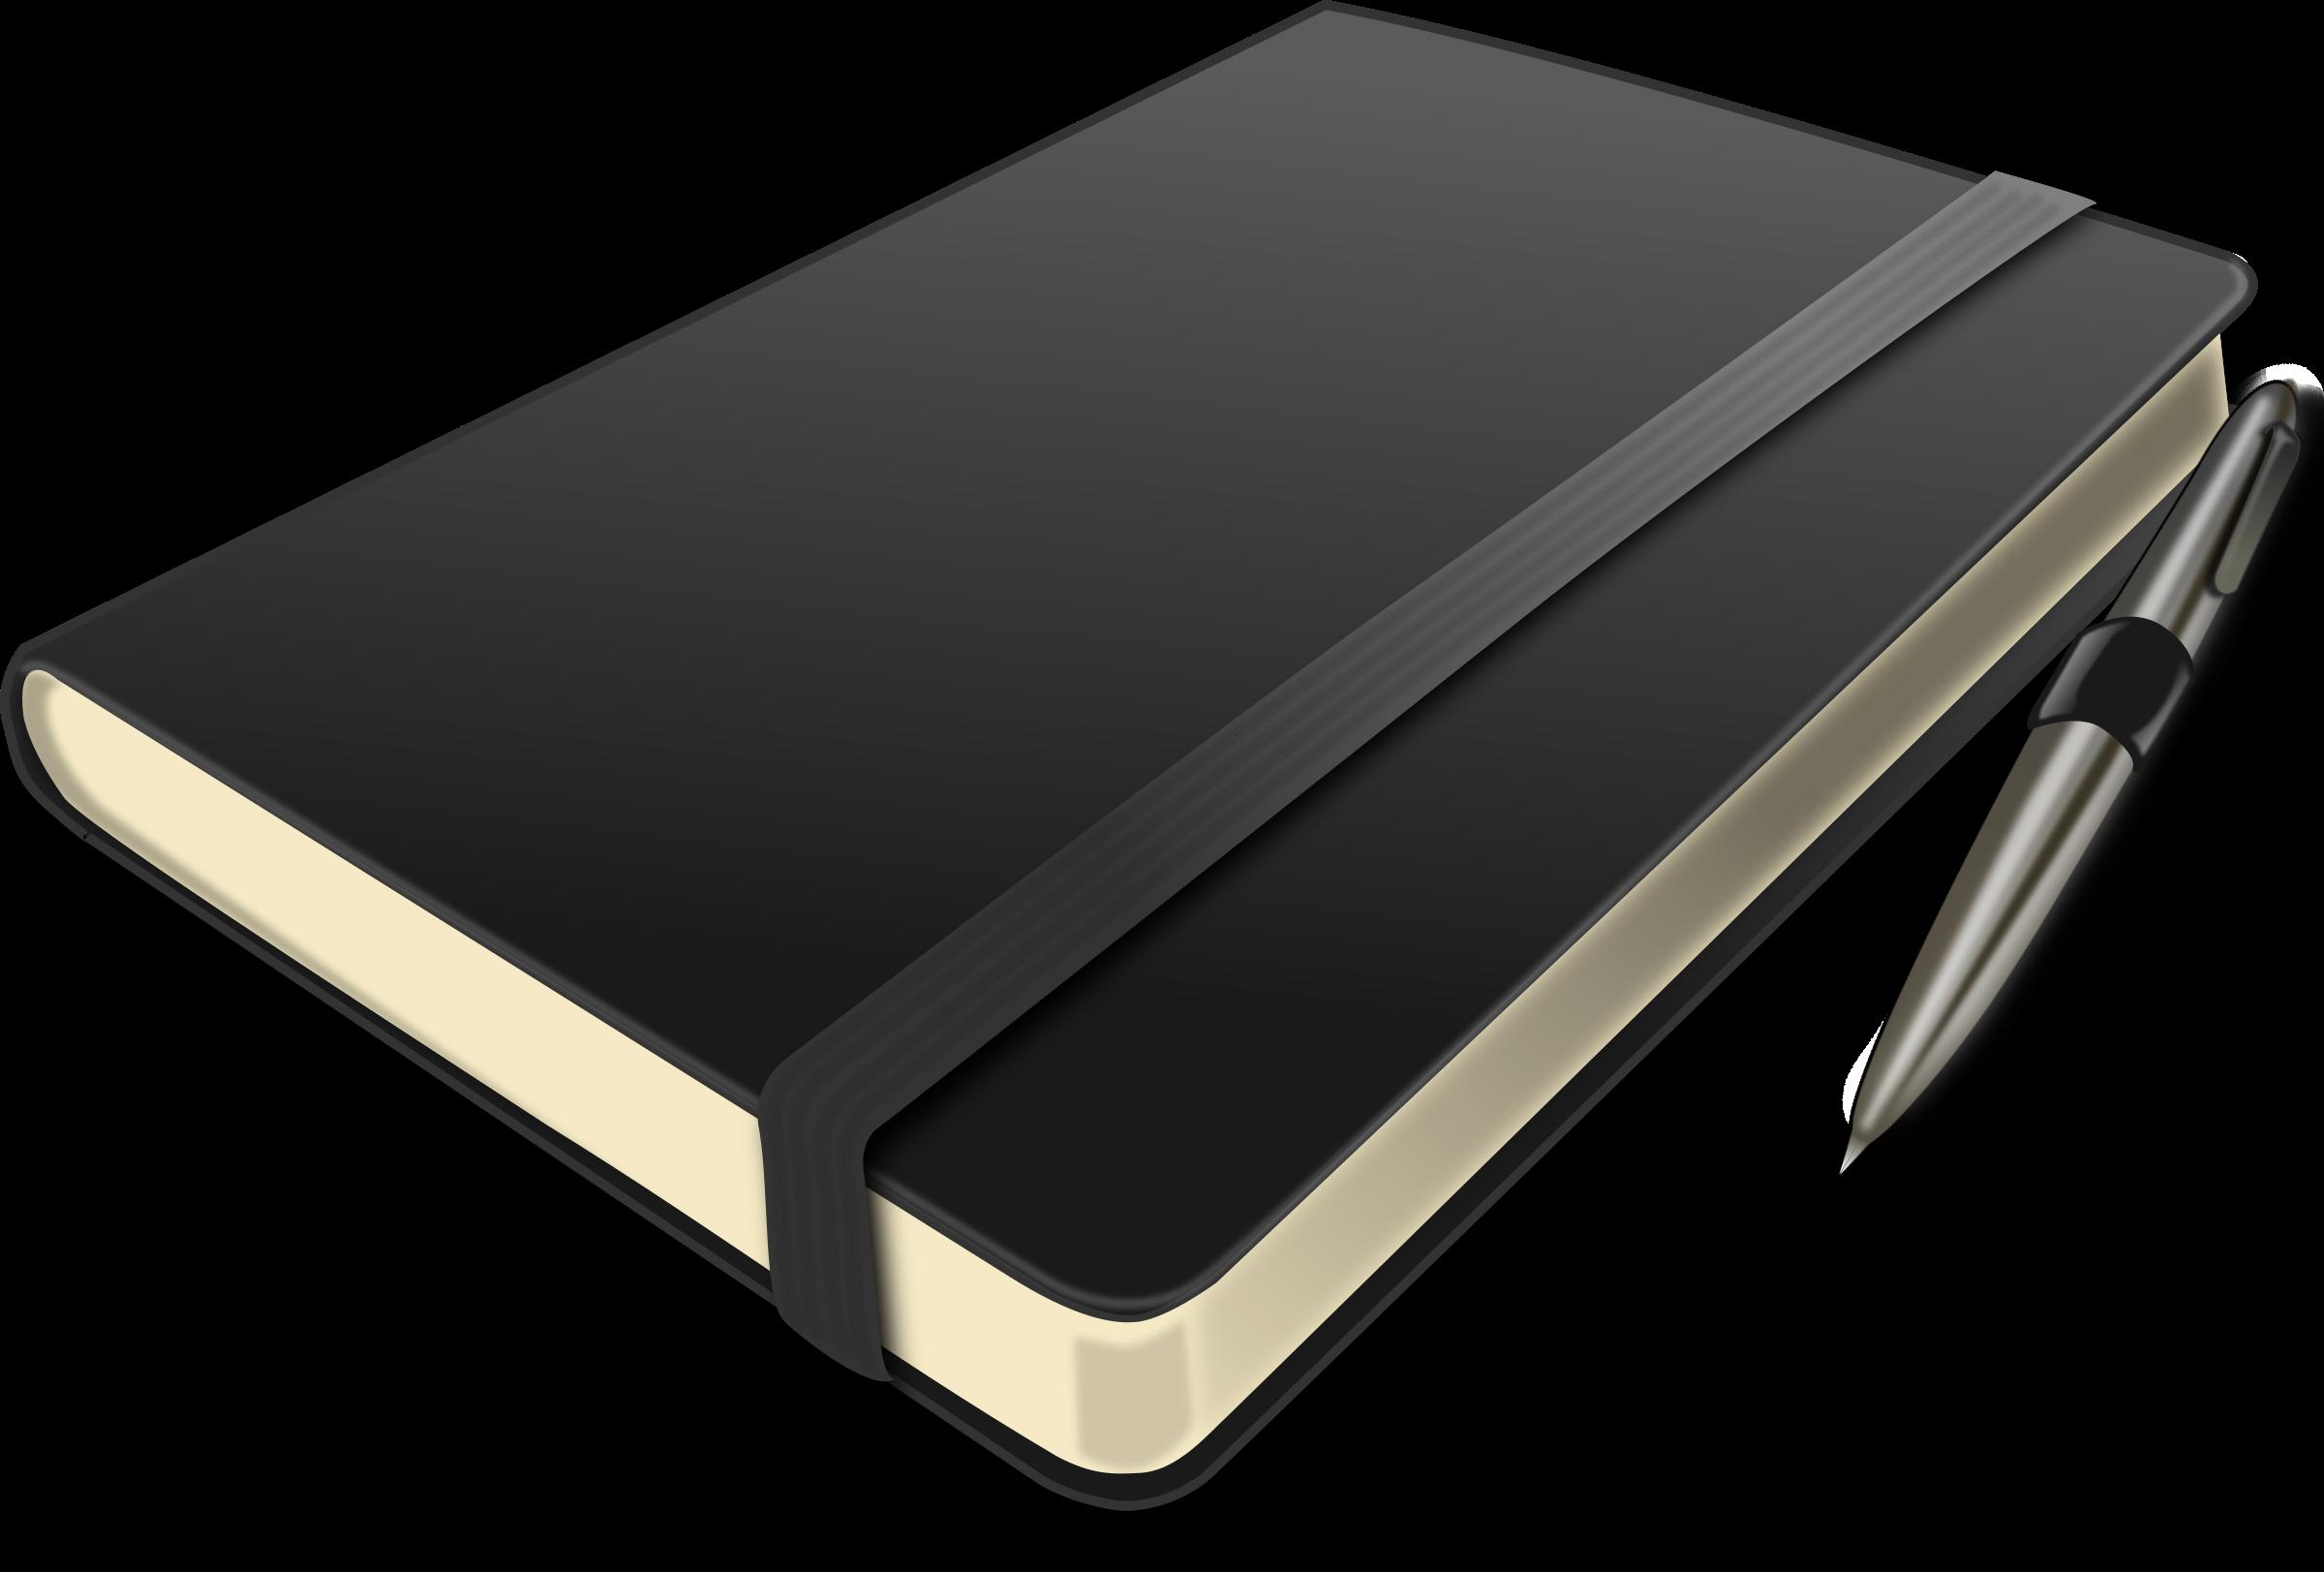 Notebook clipart notebook pen. Big image png